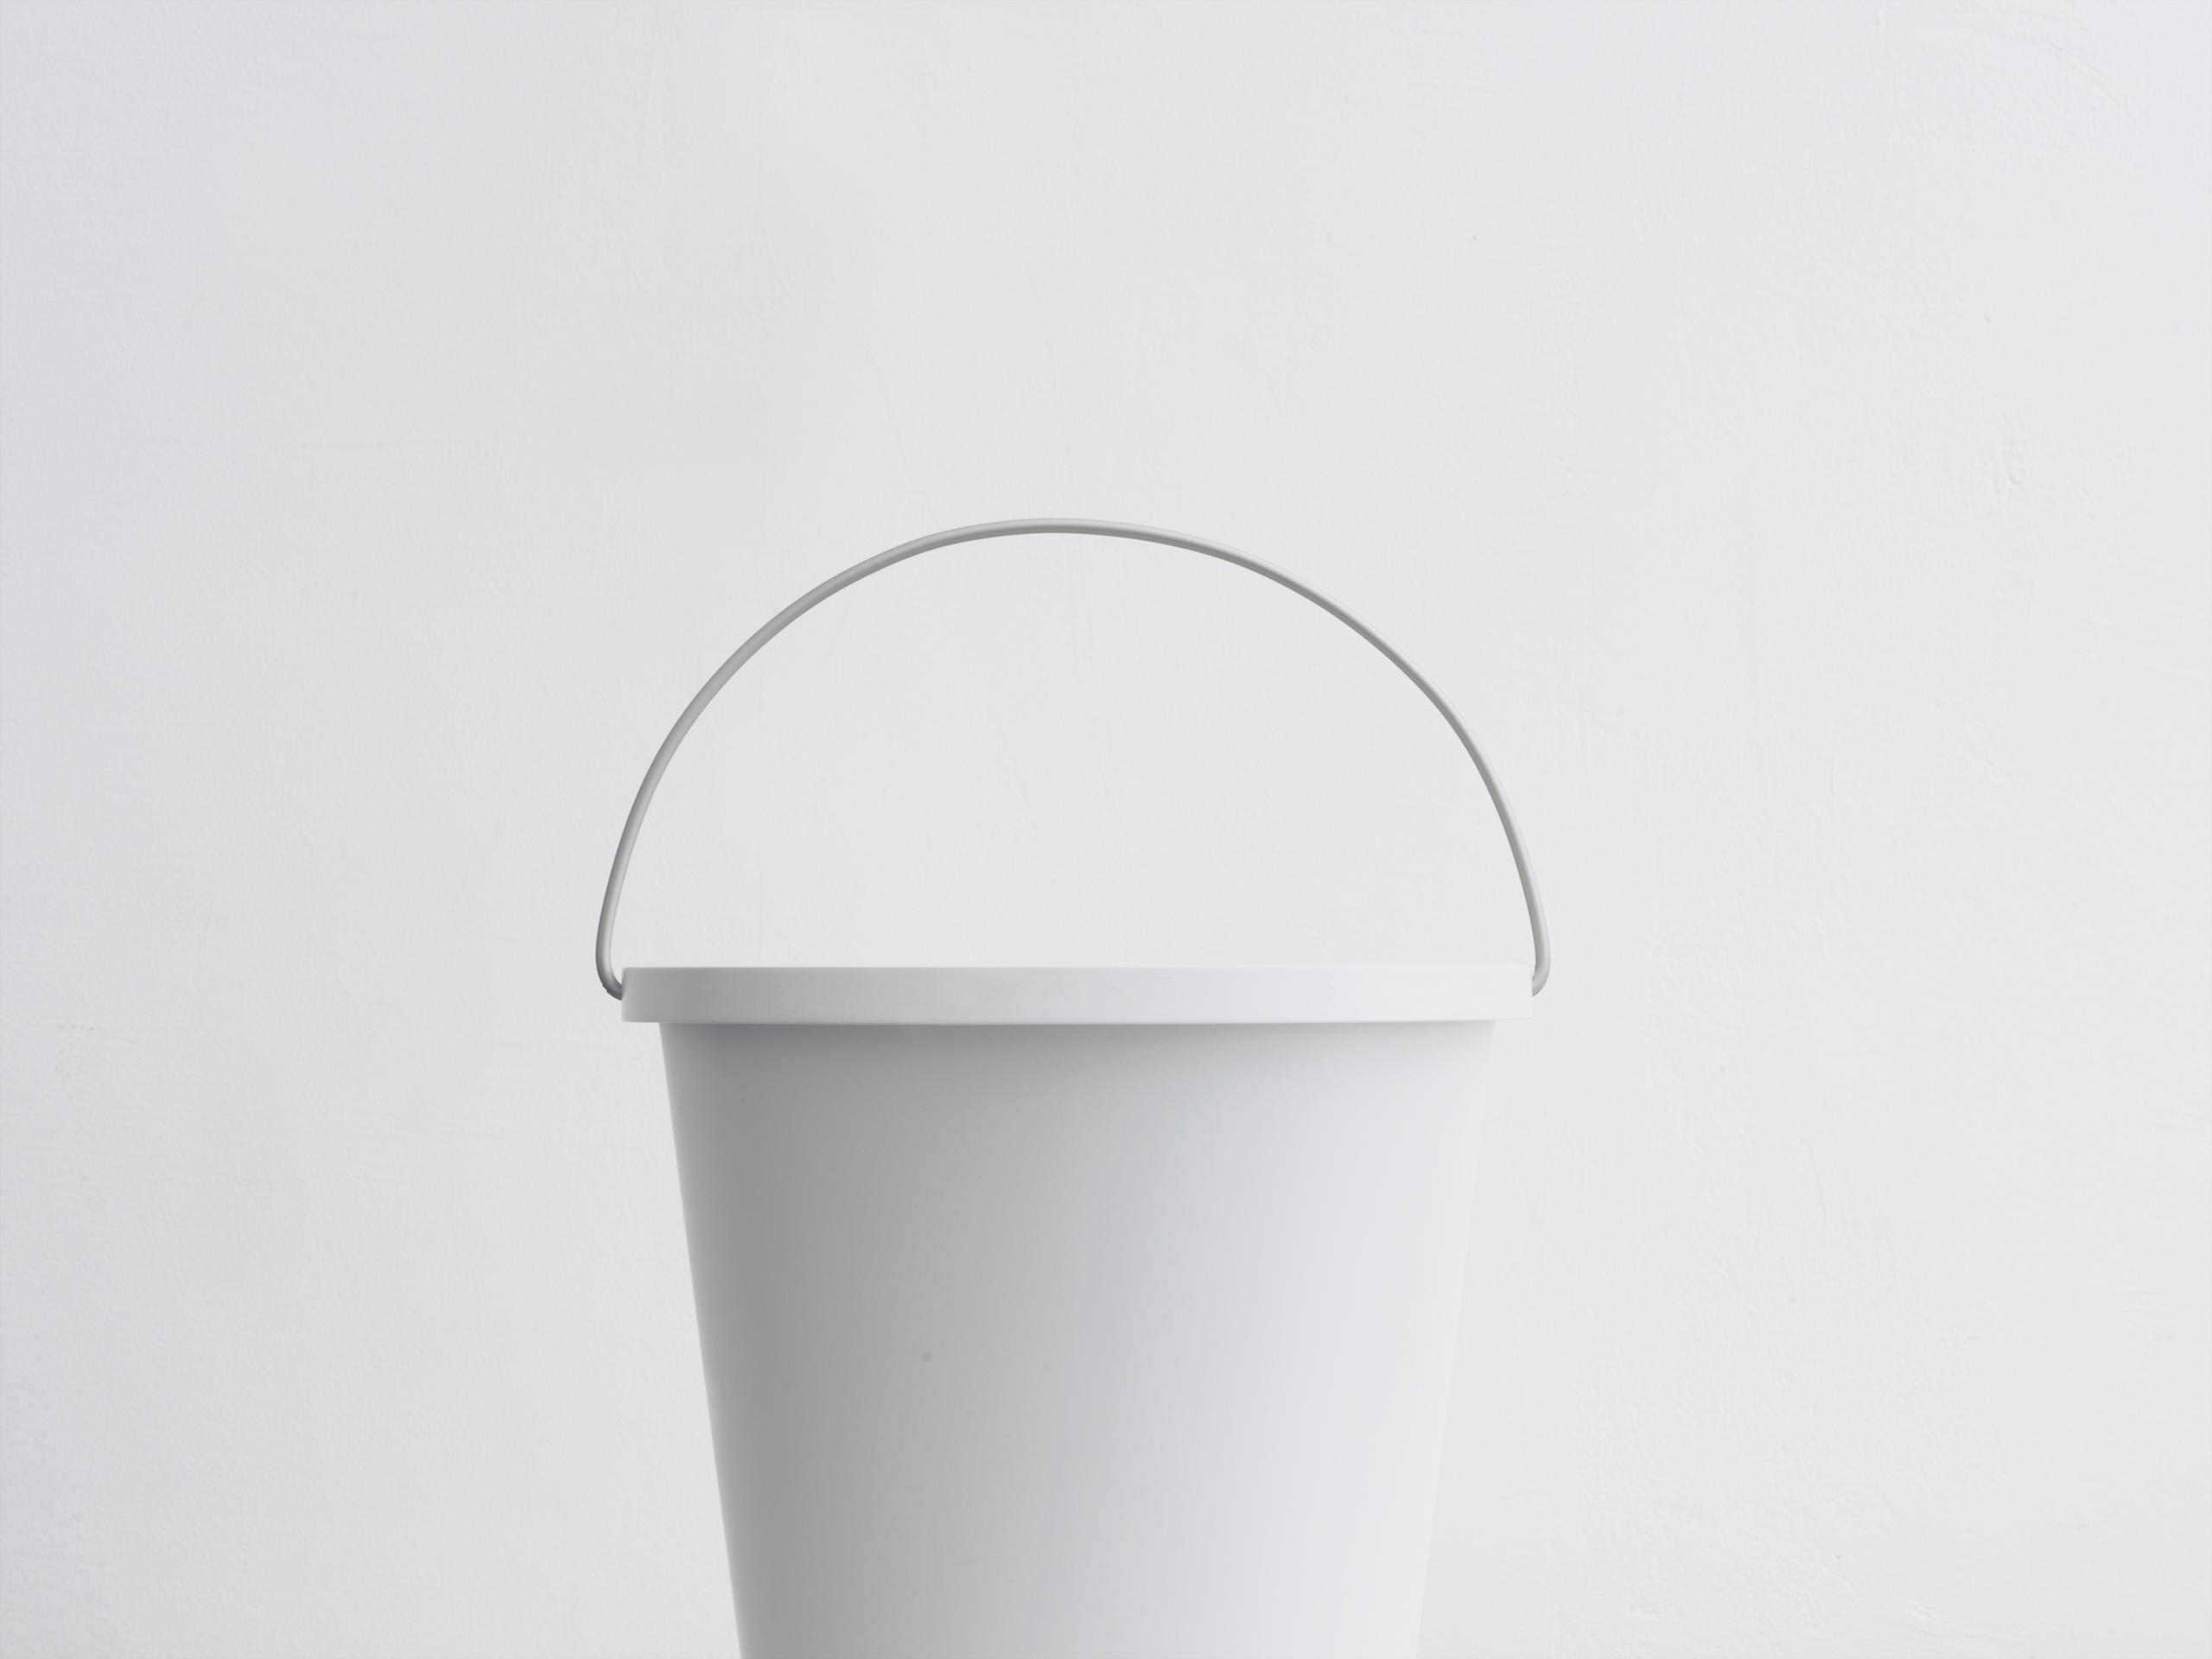 gerhardt_kellermann_muji_bucket-02